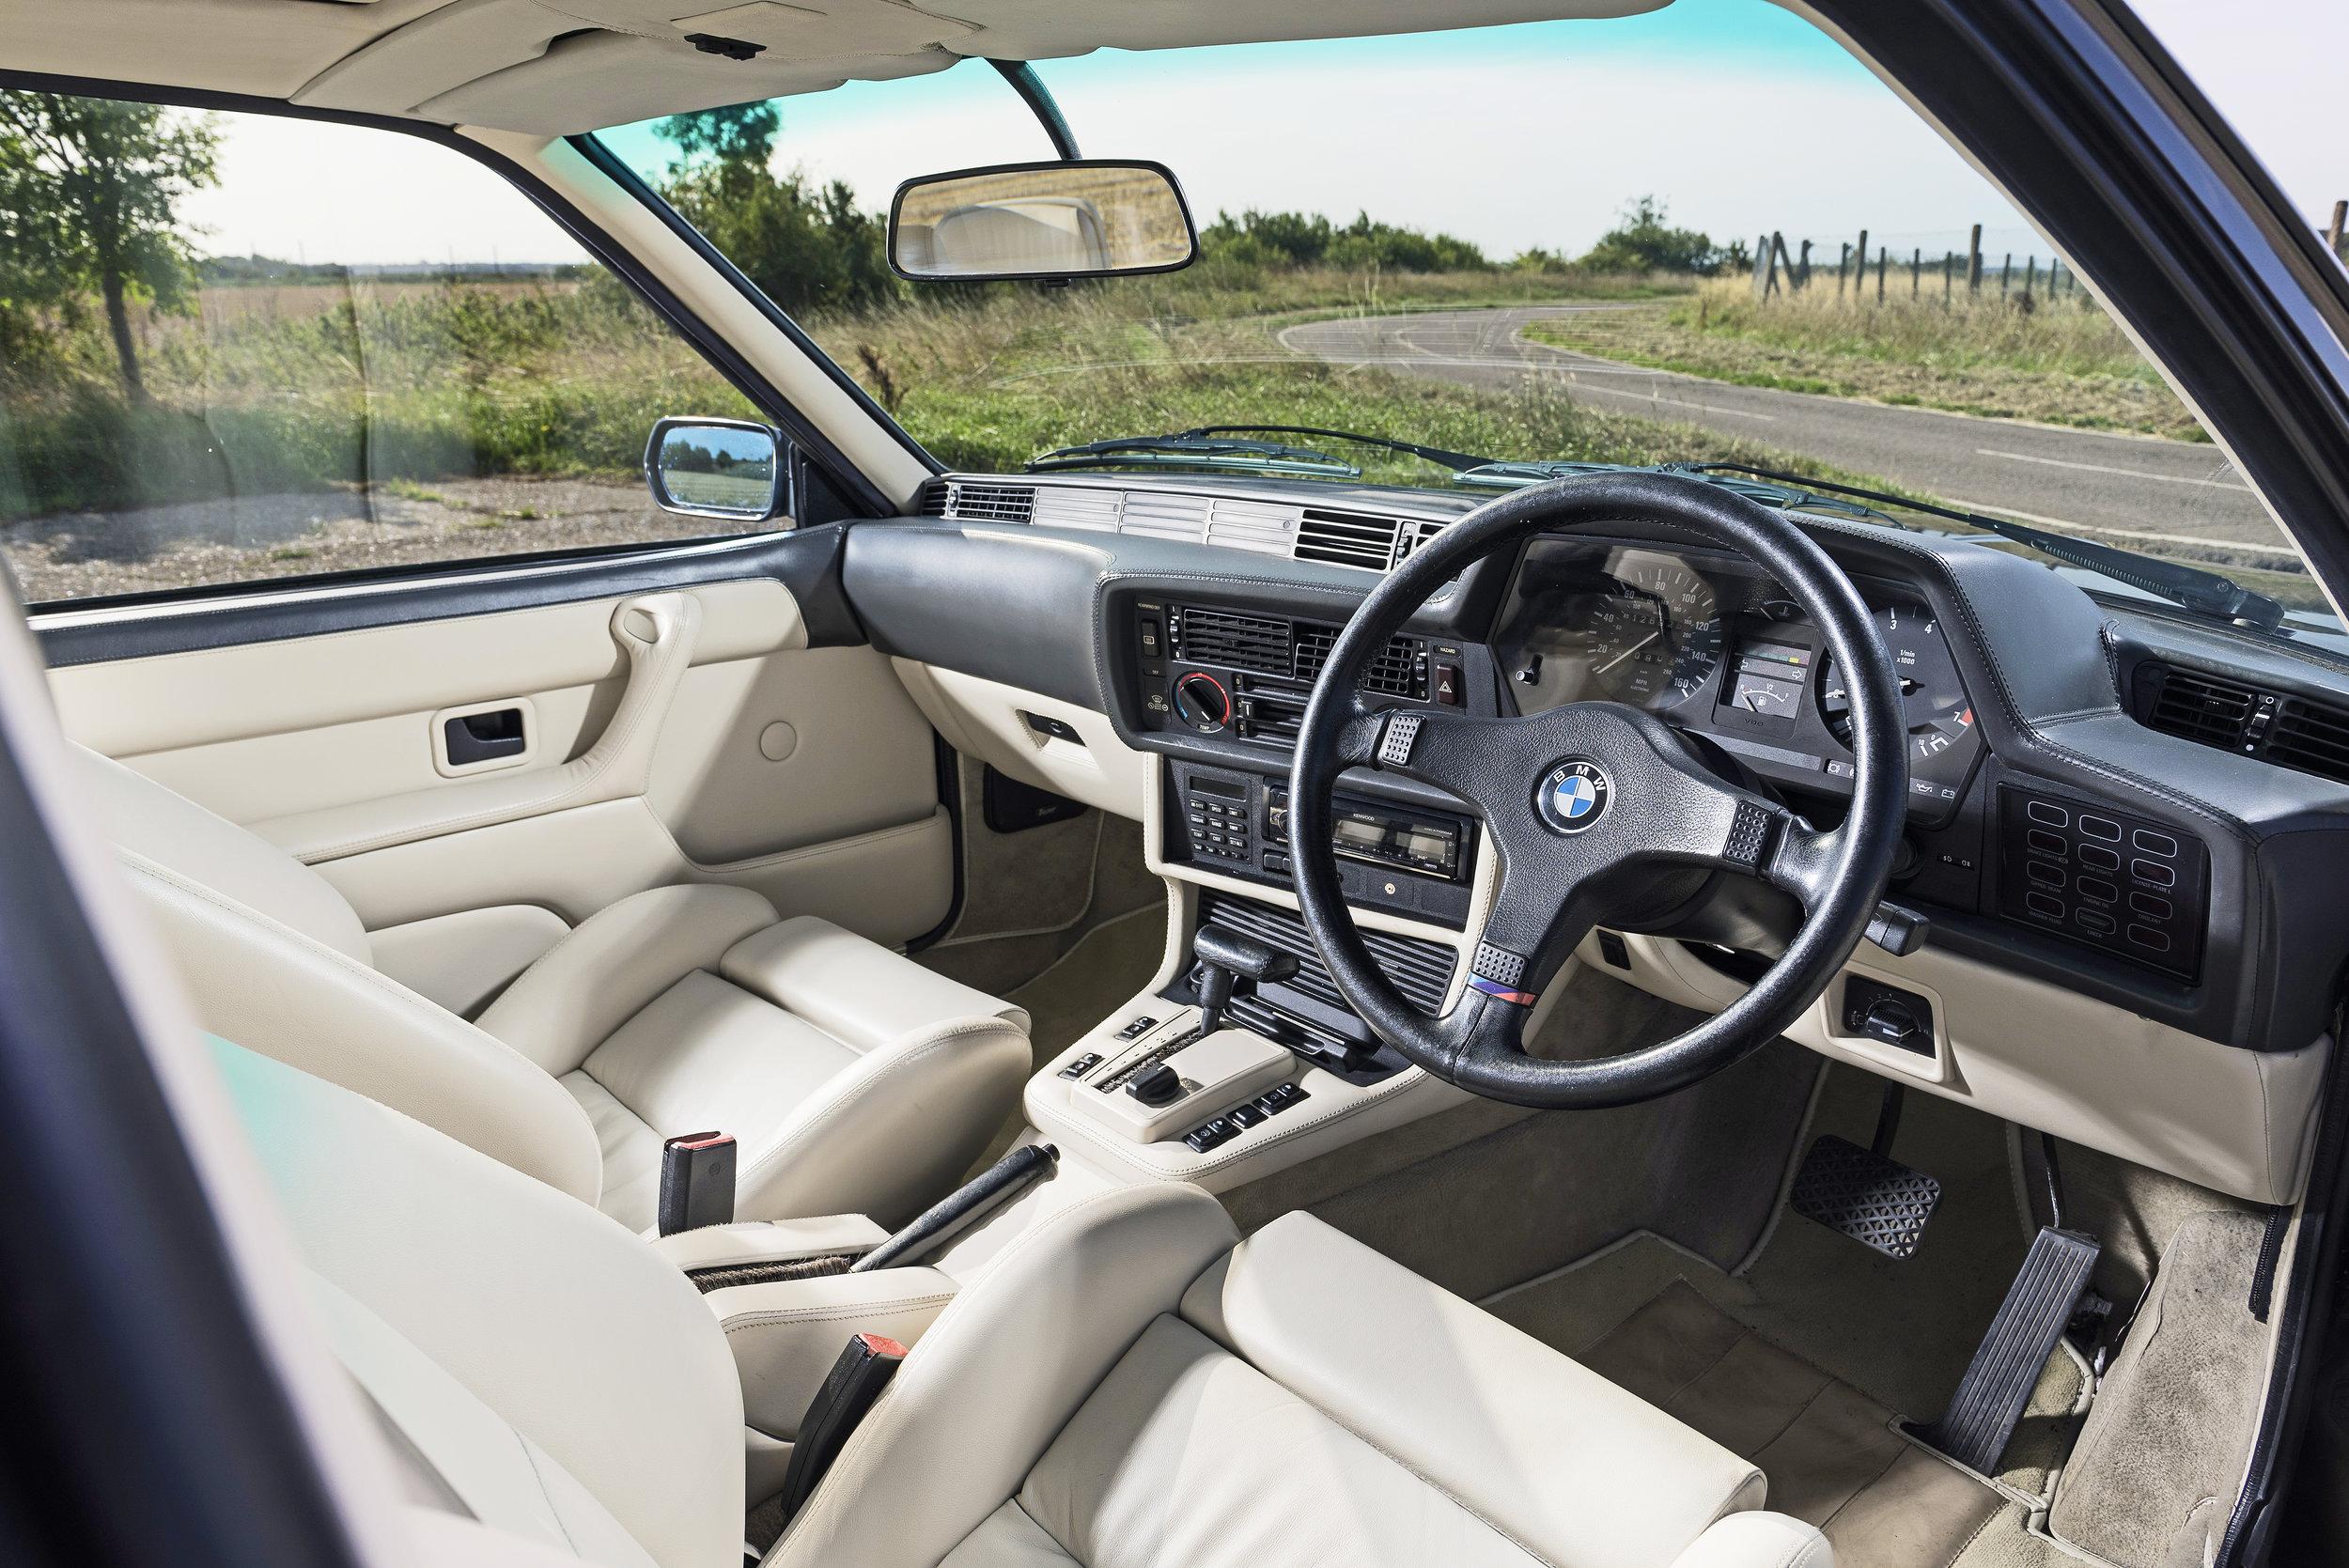 modernclassics-BMW-635i-Mercedes-E320-jordanbutters-2.jpg